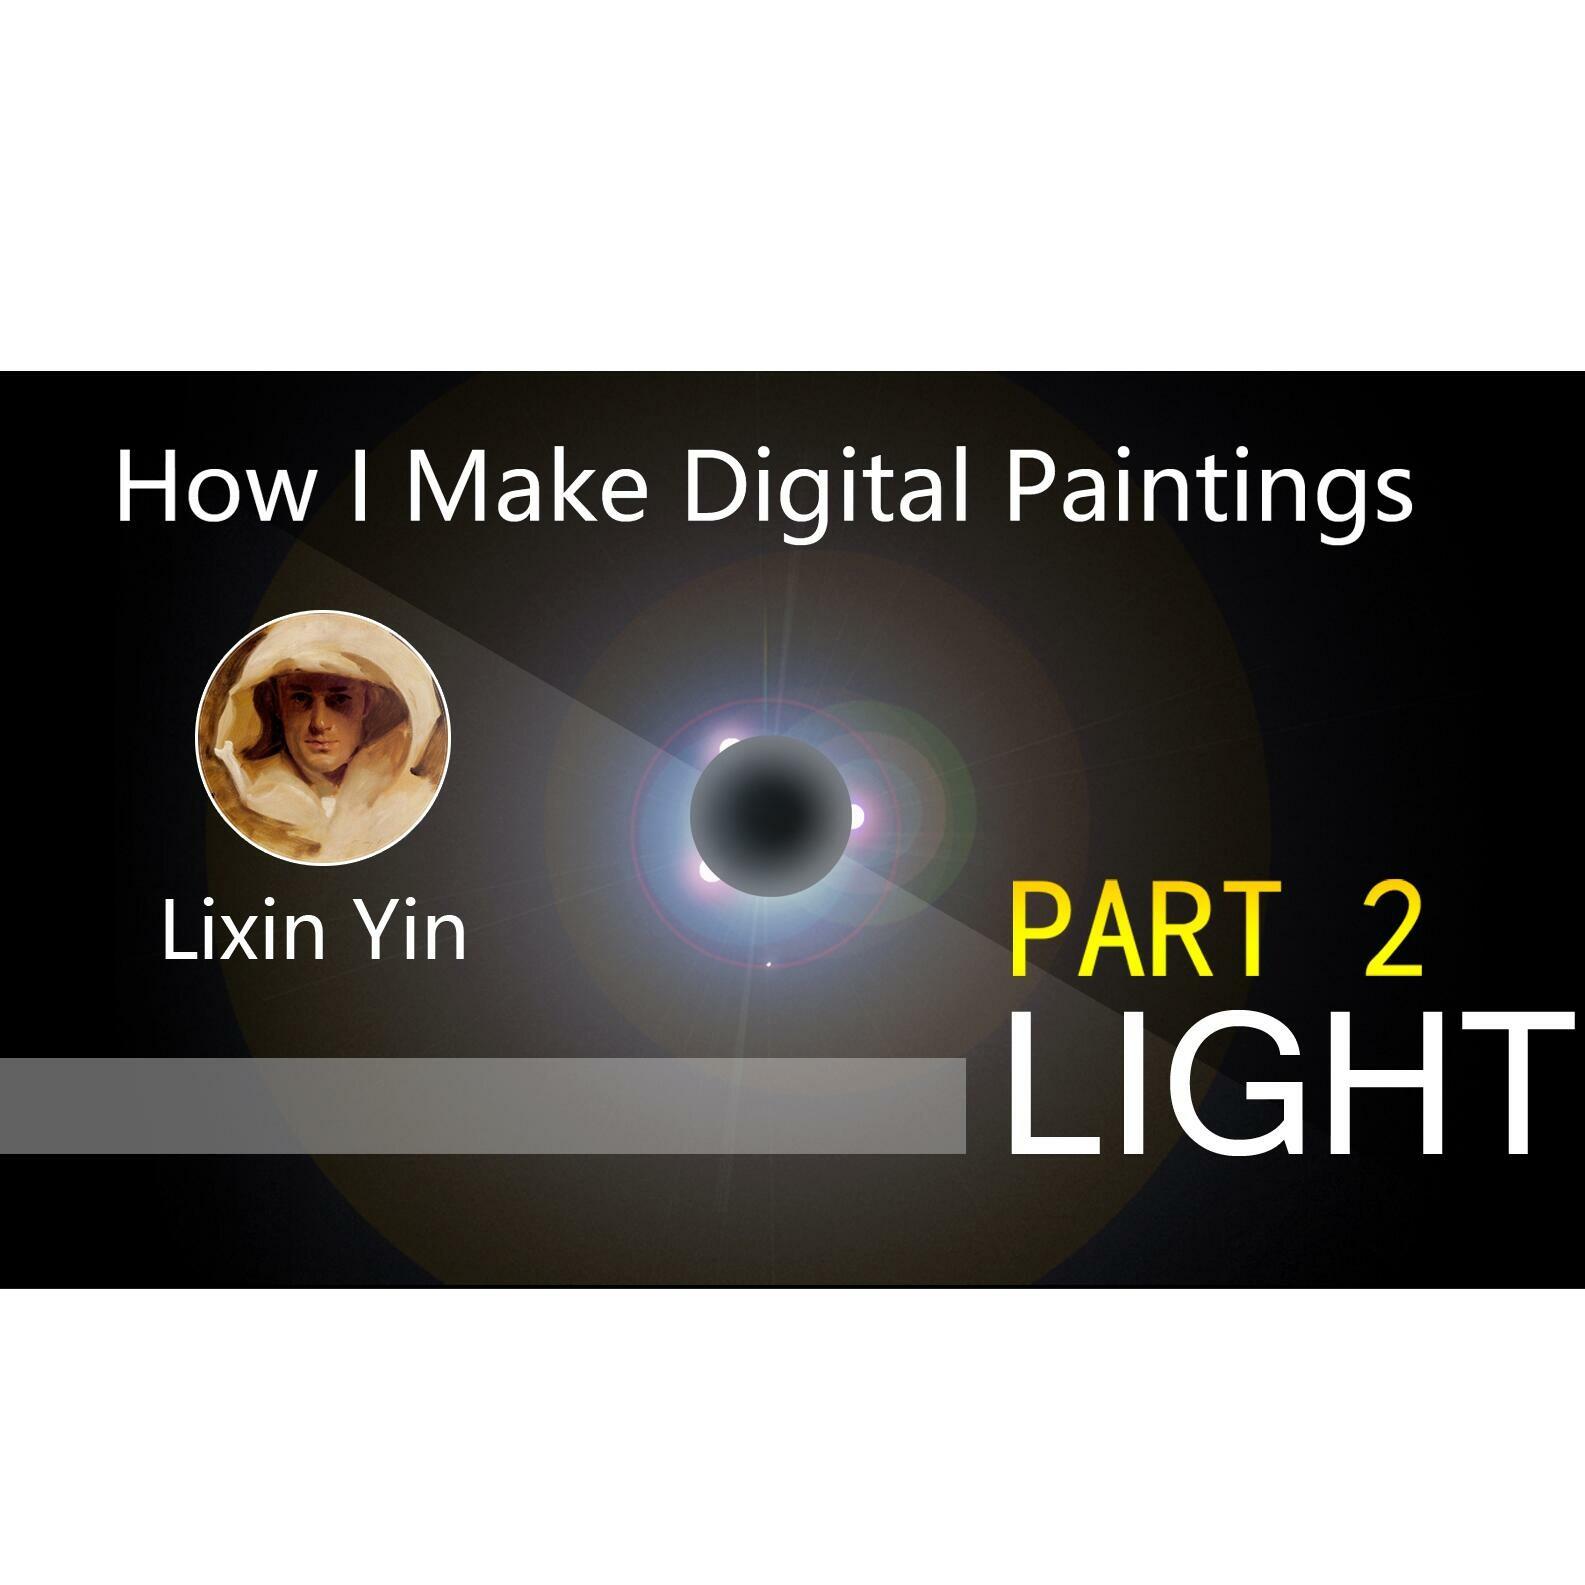 How I Make Digital Paintings | Light - part 2